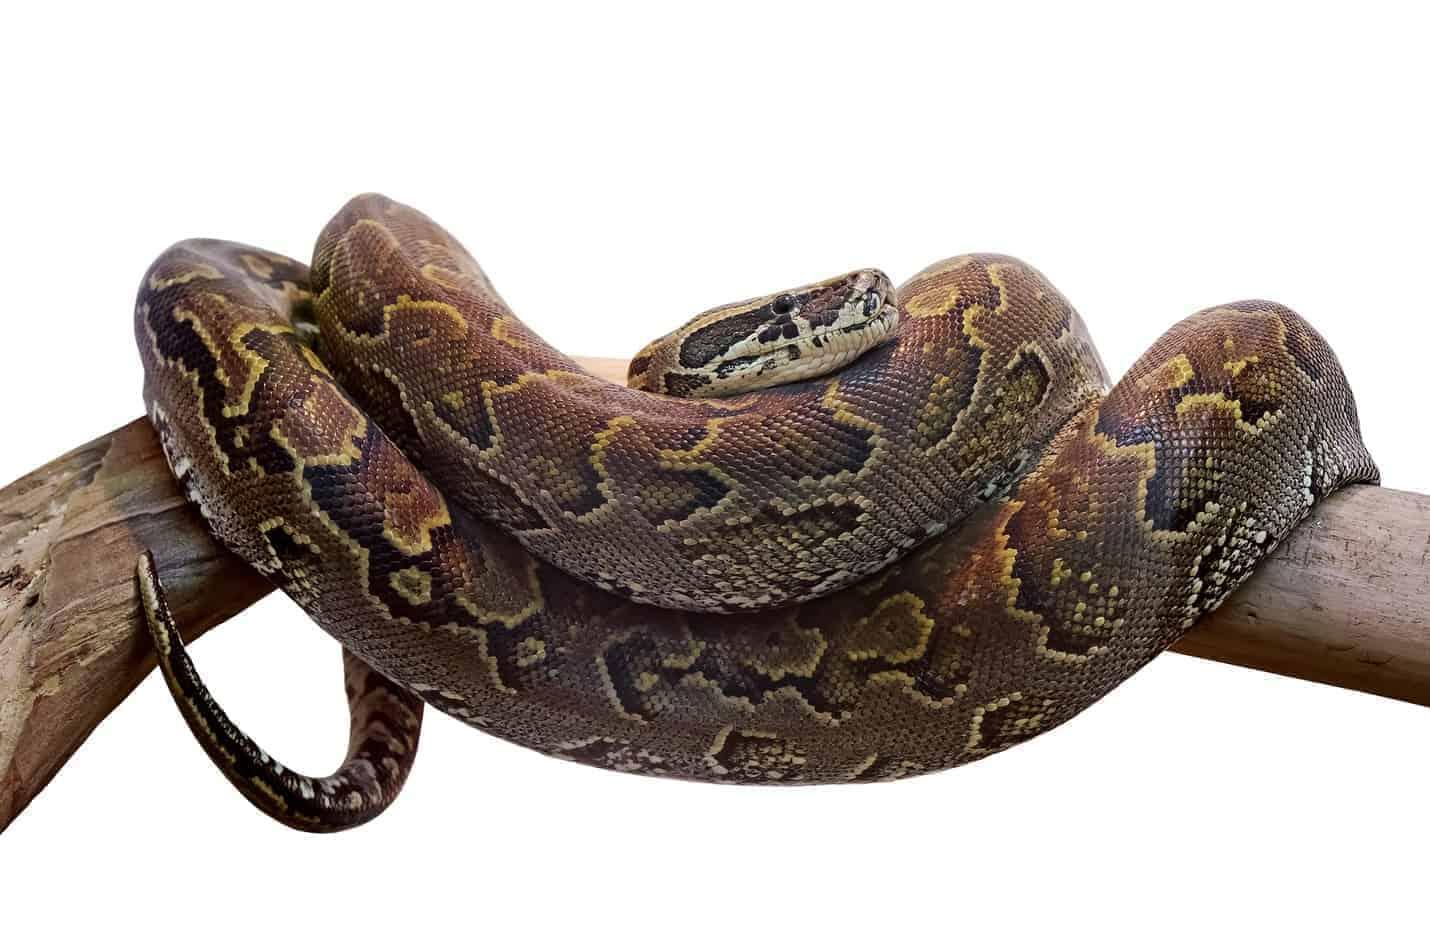 Buyer's Guide: Bedding for Boa Snakes